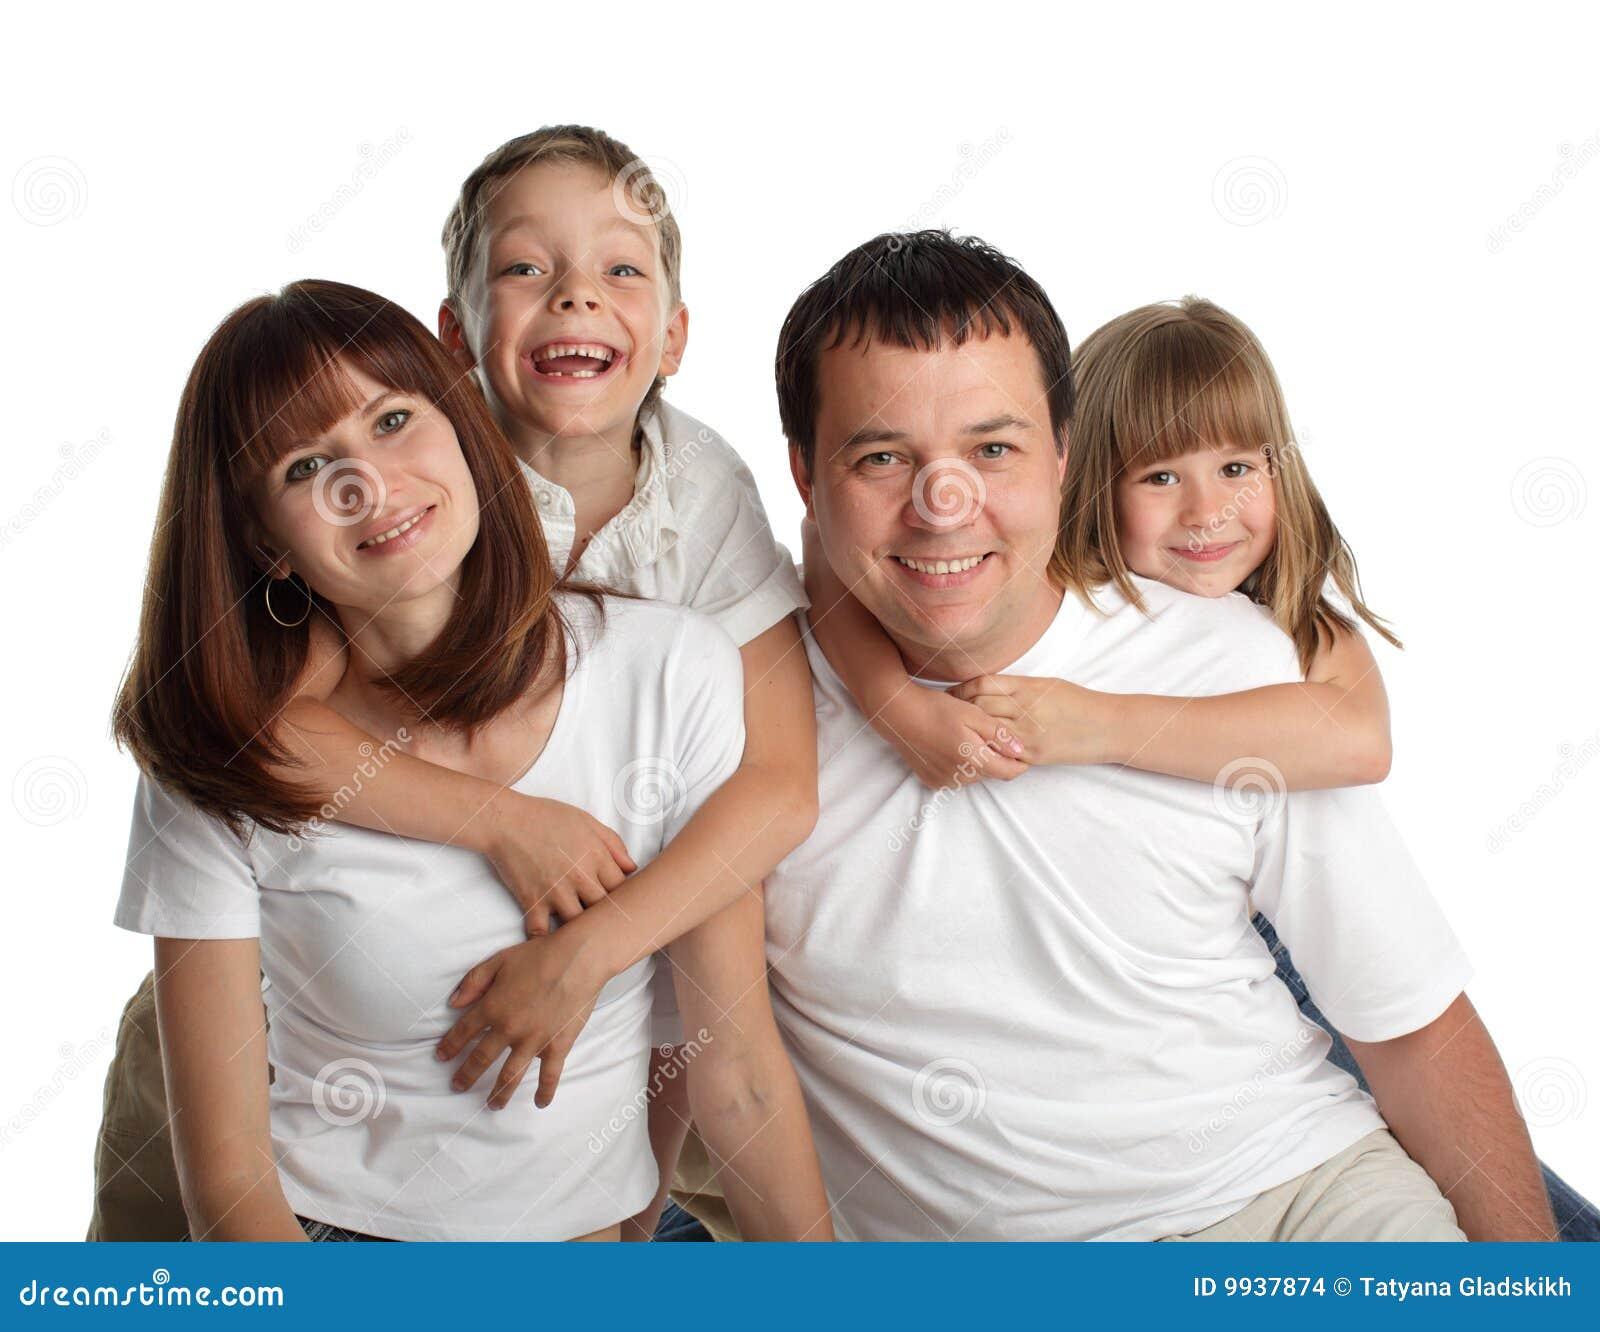 Семья дети фото галерея